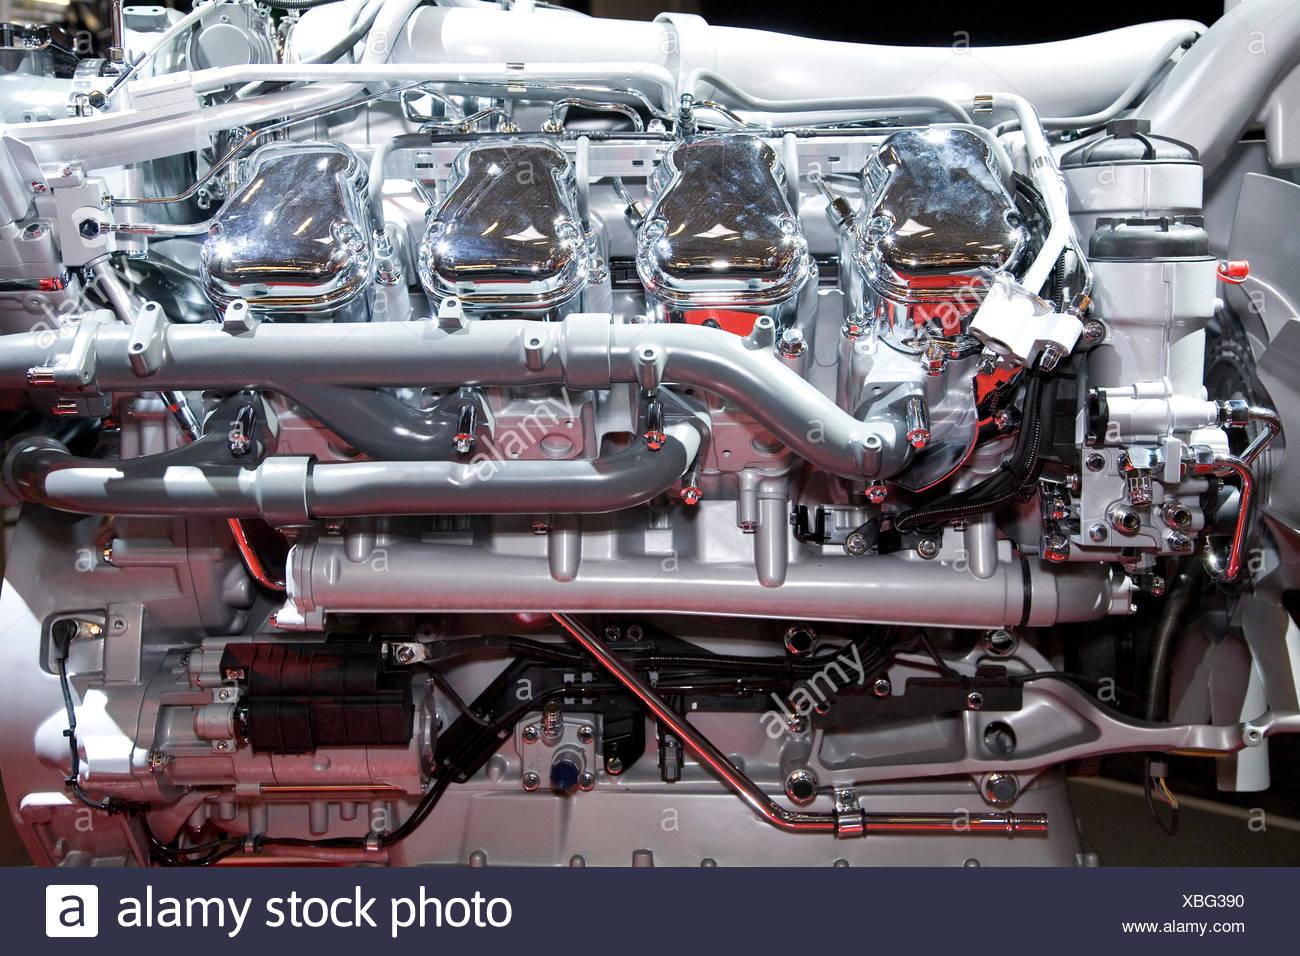 Diesel Motor Engine Stockfotos & Diesel Motor Engine Bilder - Alamy